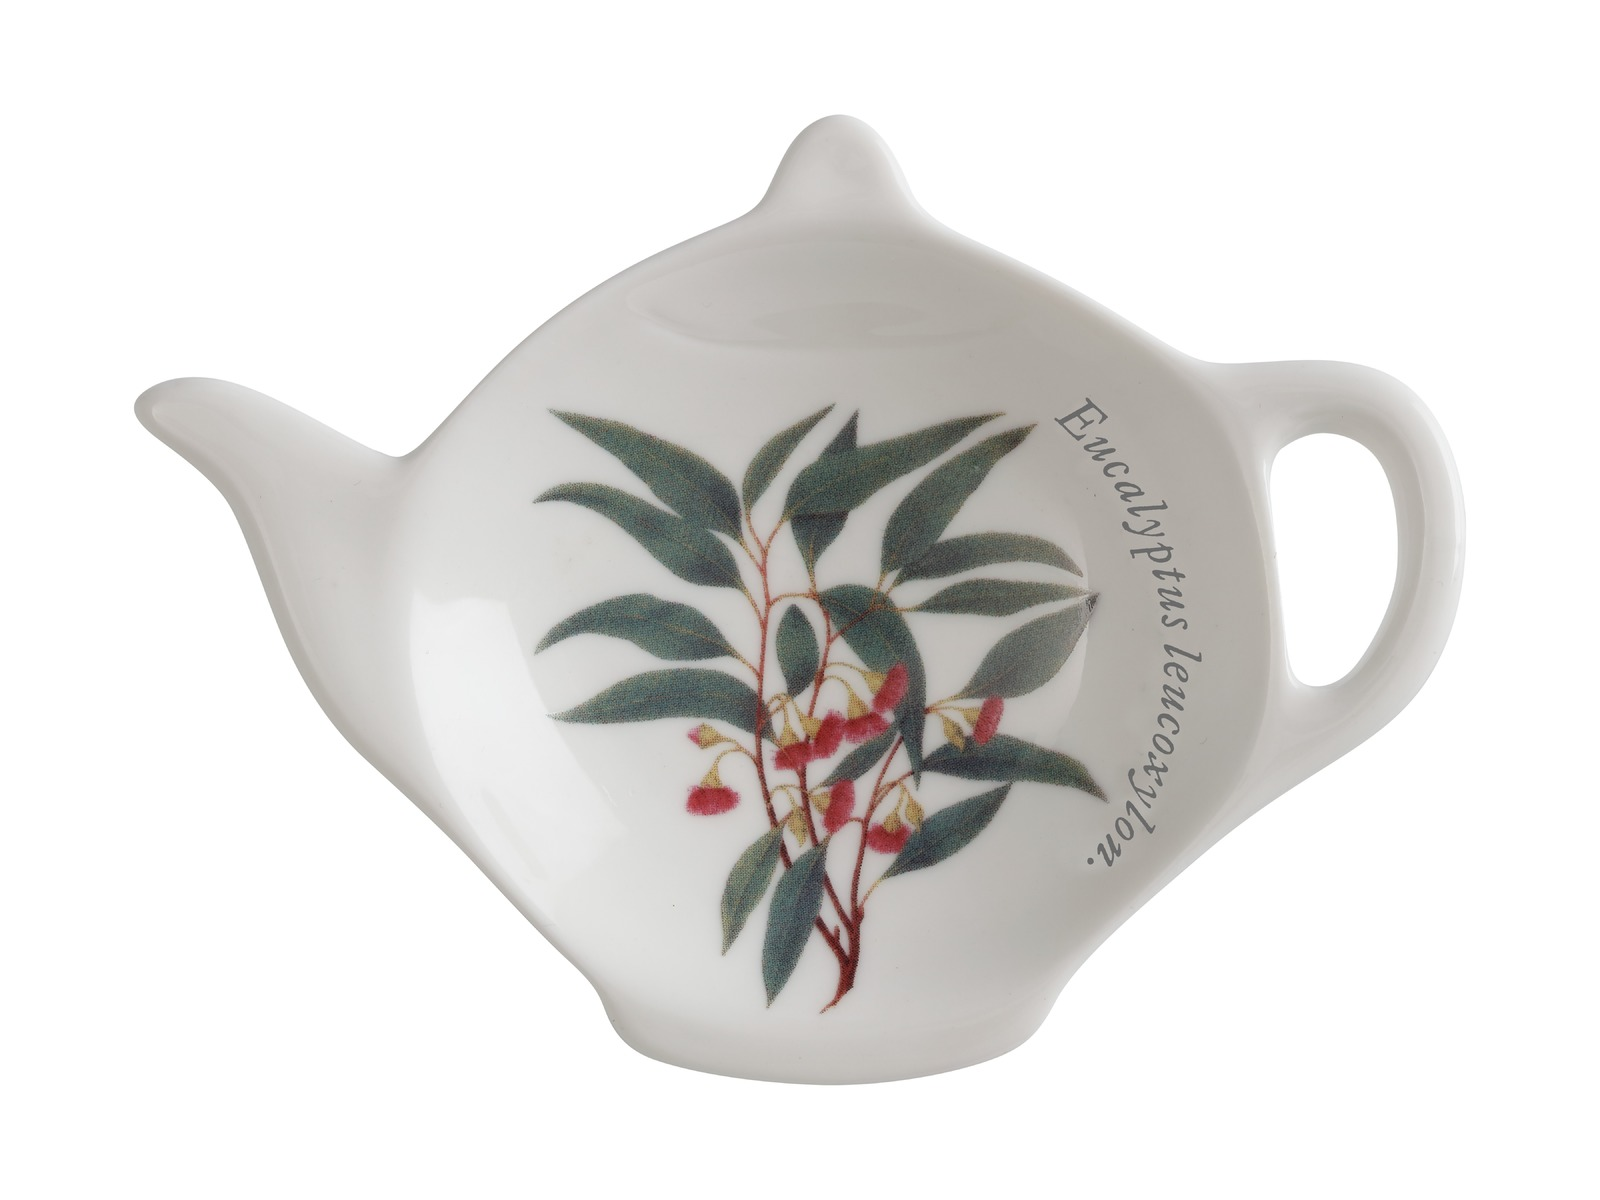 Maxwell & Williams: Royal Botanic Garden Tea Bag Tidy - Flowering Gum image